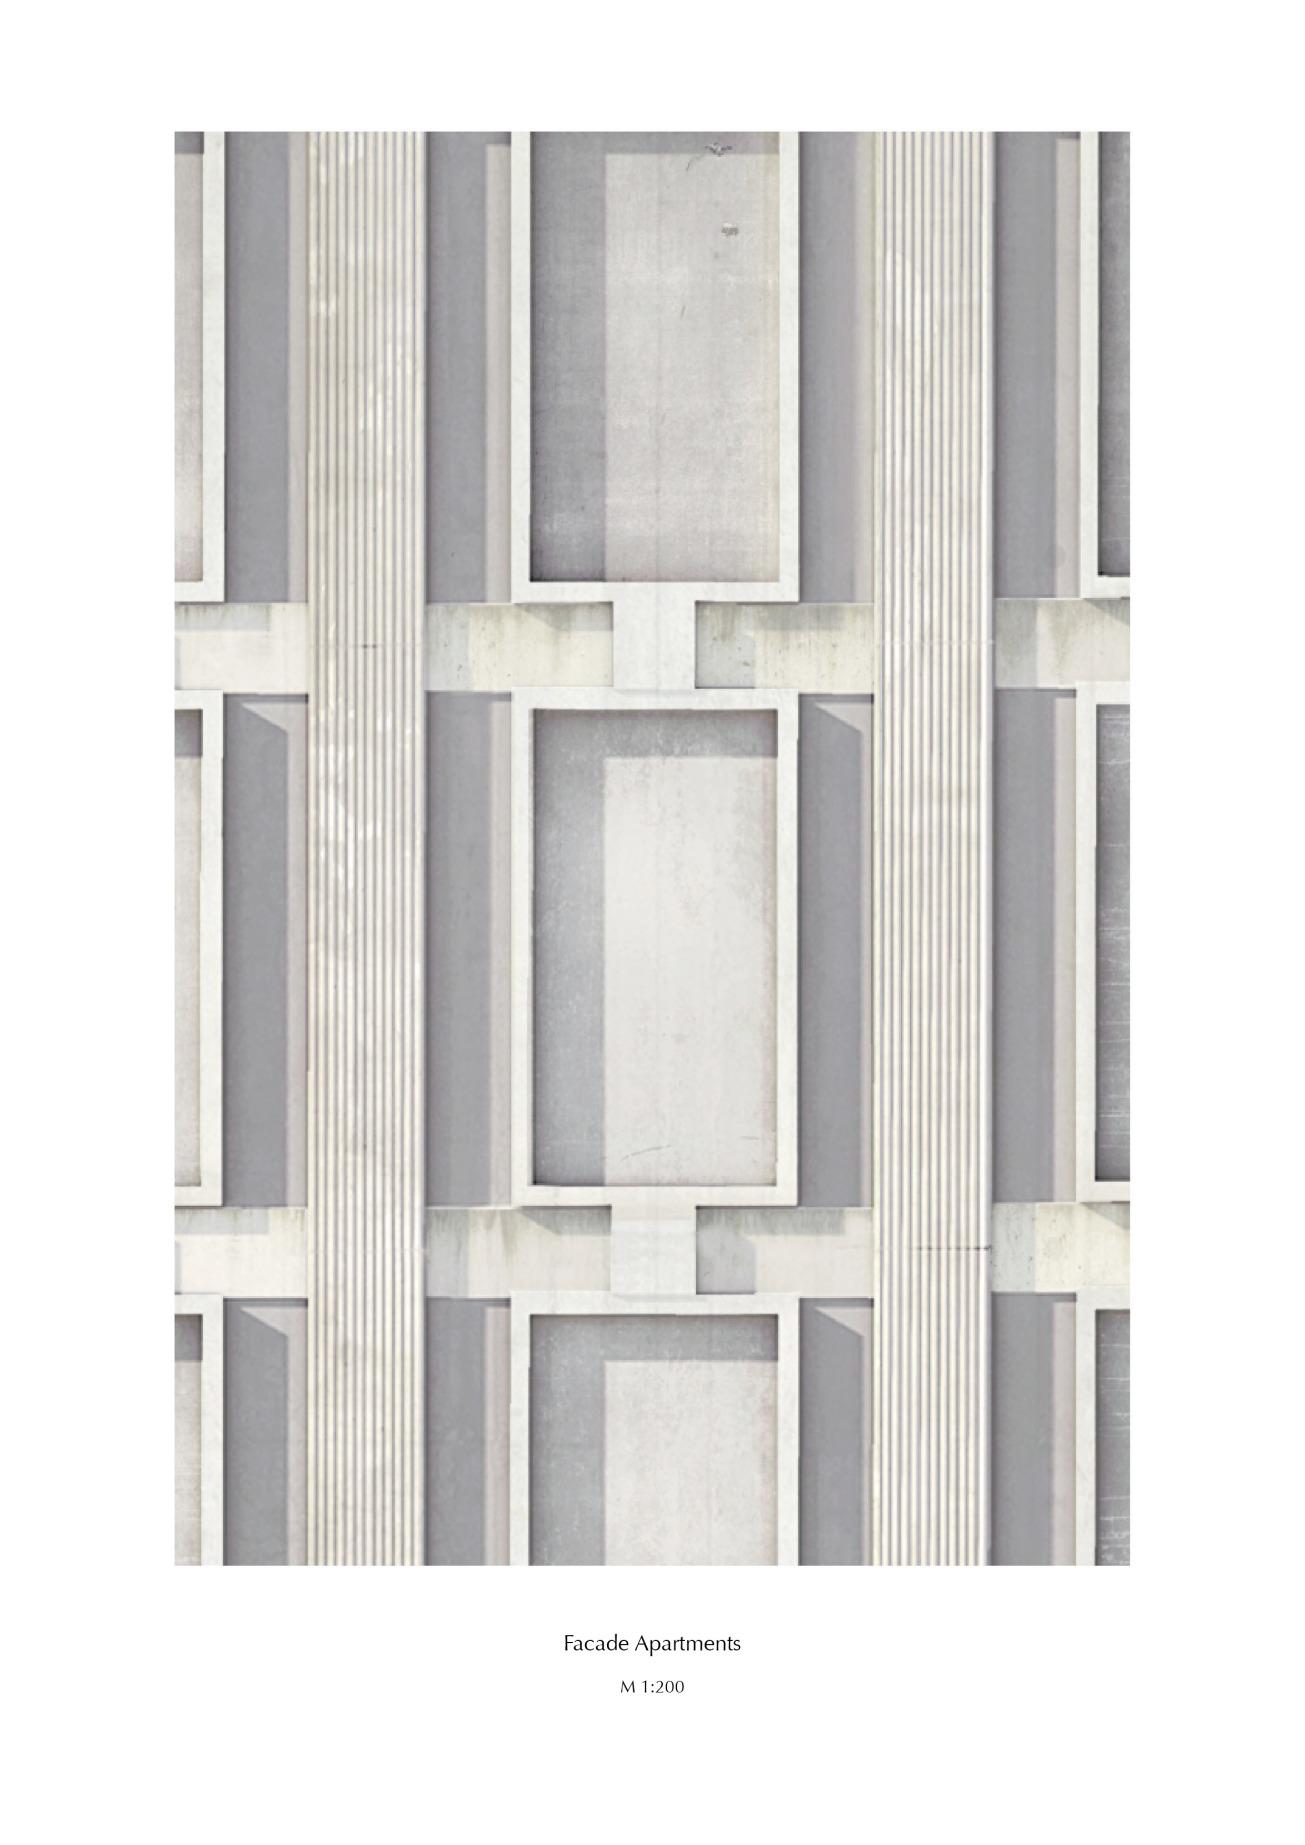 Megastructures -Reuse and Extension Karstadt Munich, Lena Teresa Kohl, Master Thesis, (2016, Technical University of Munich) 17